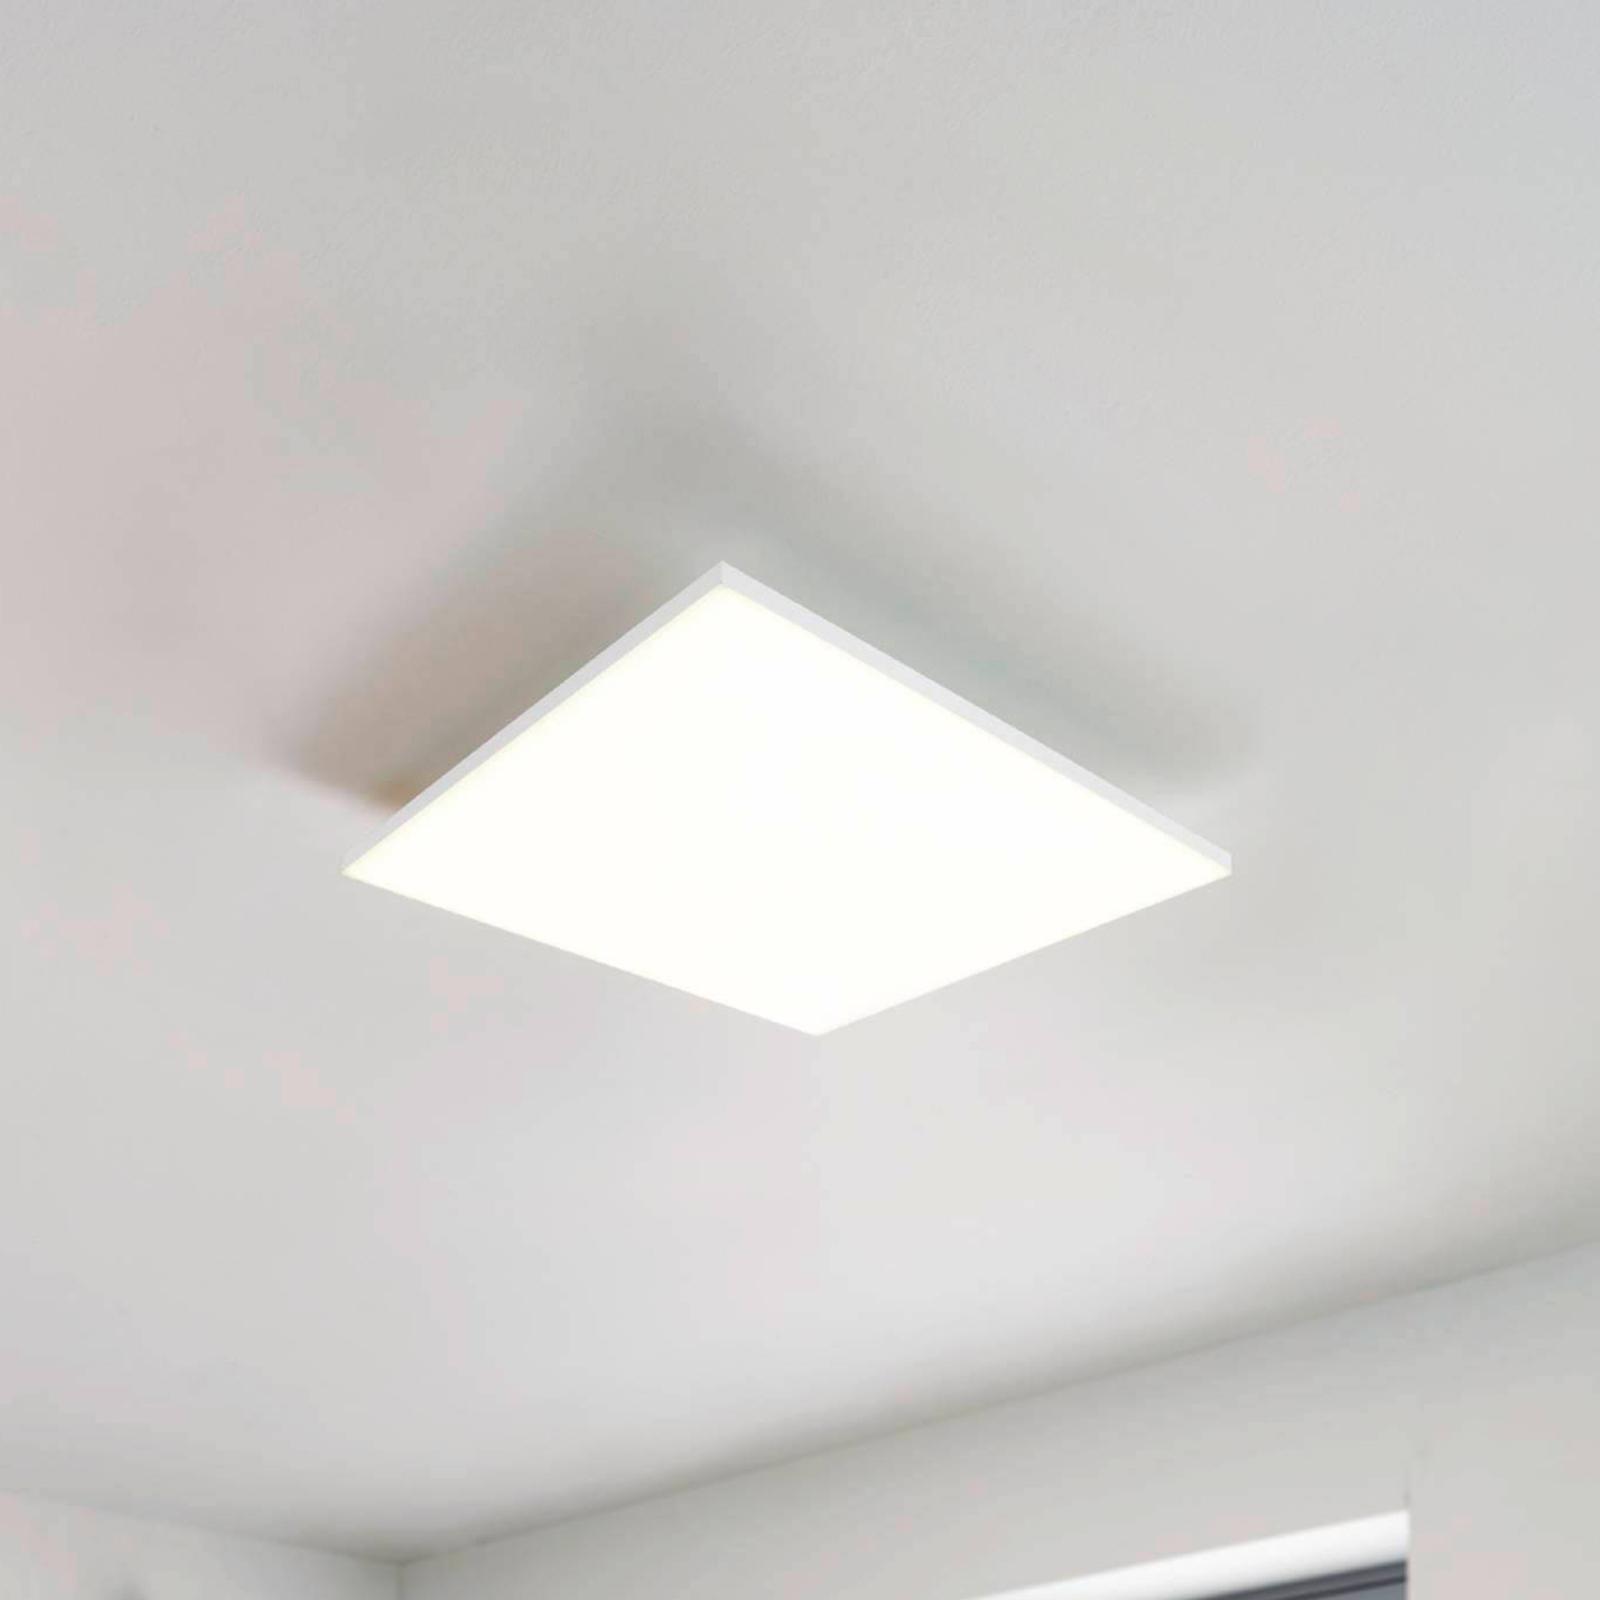 EGLO connect Turcona-C LED-panel 30 x 30 cm